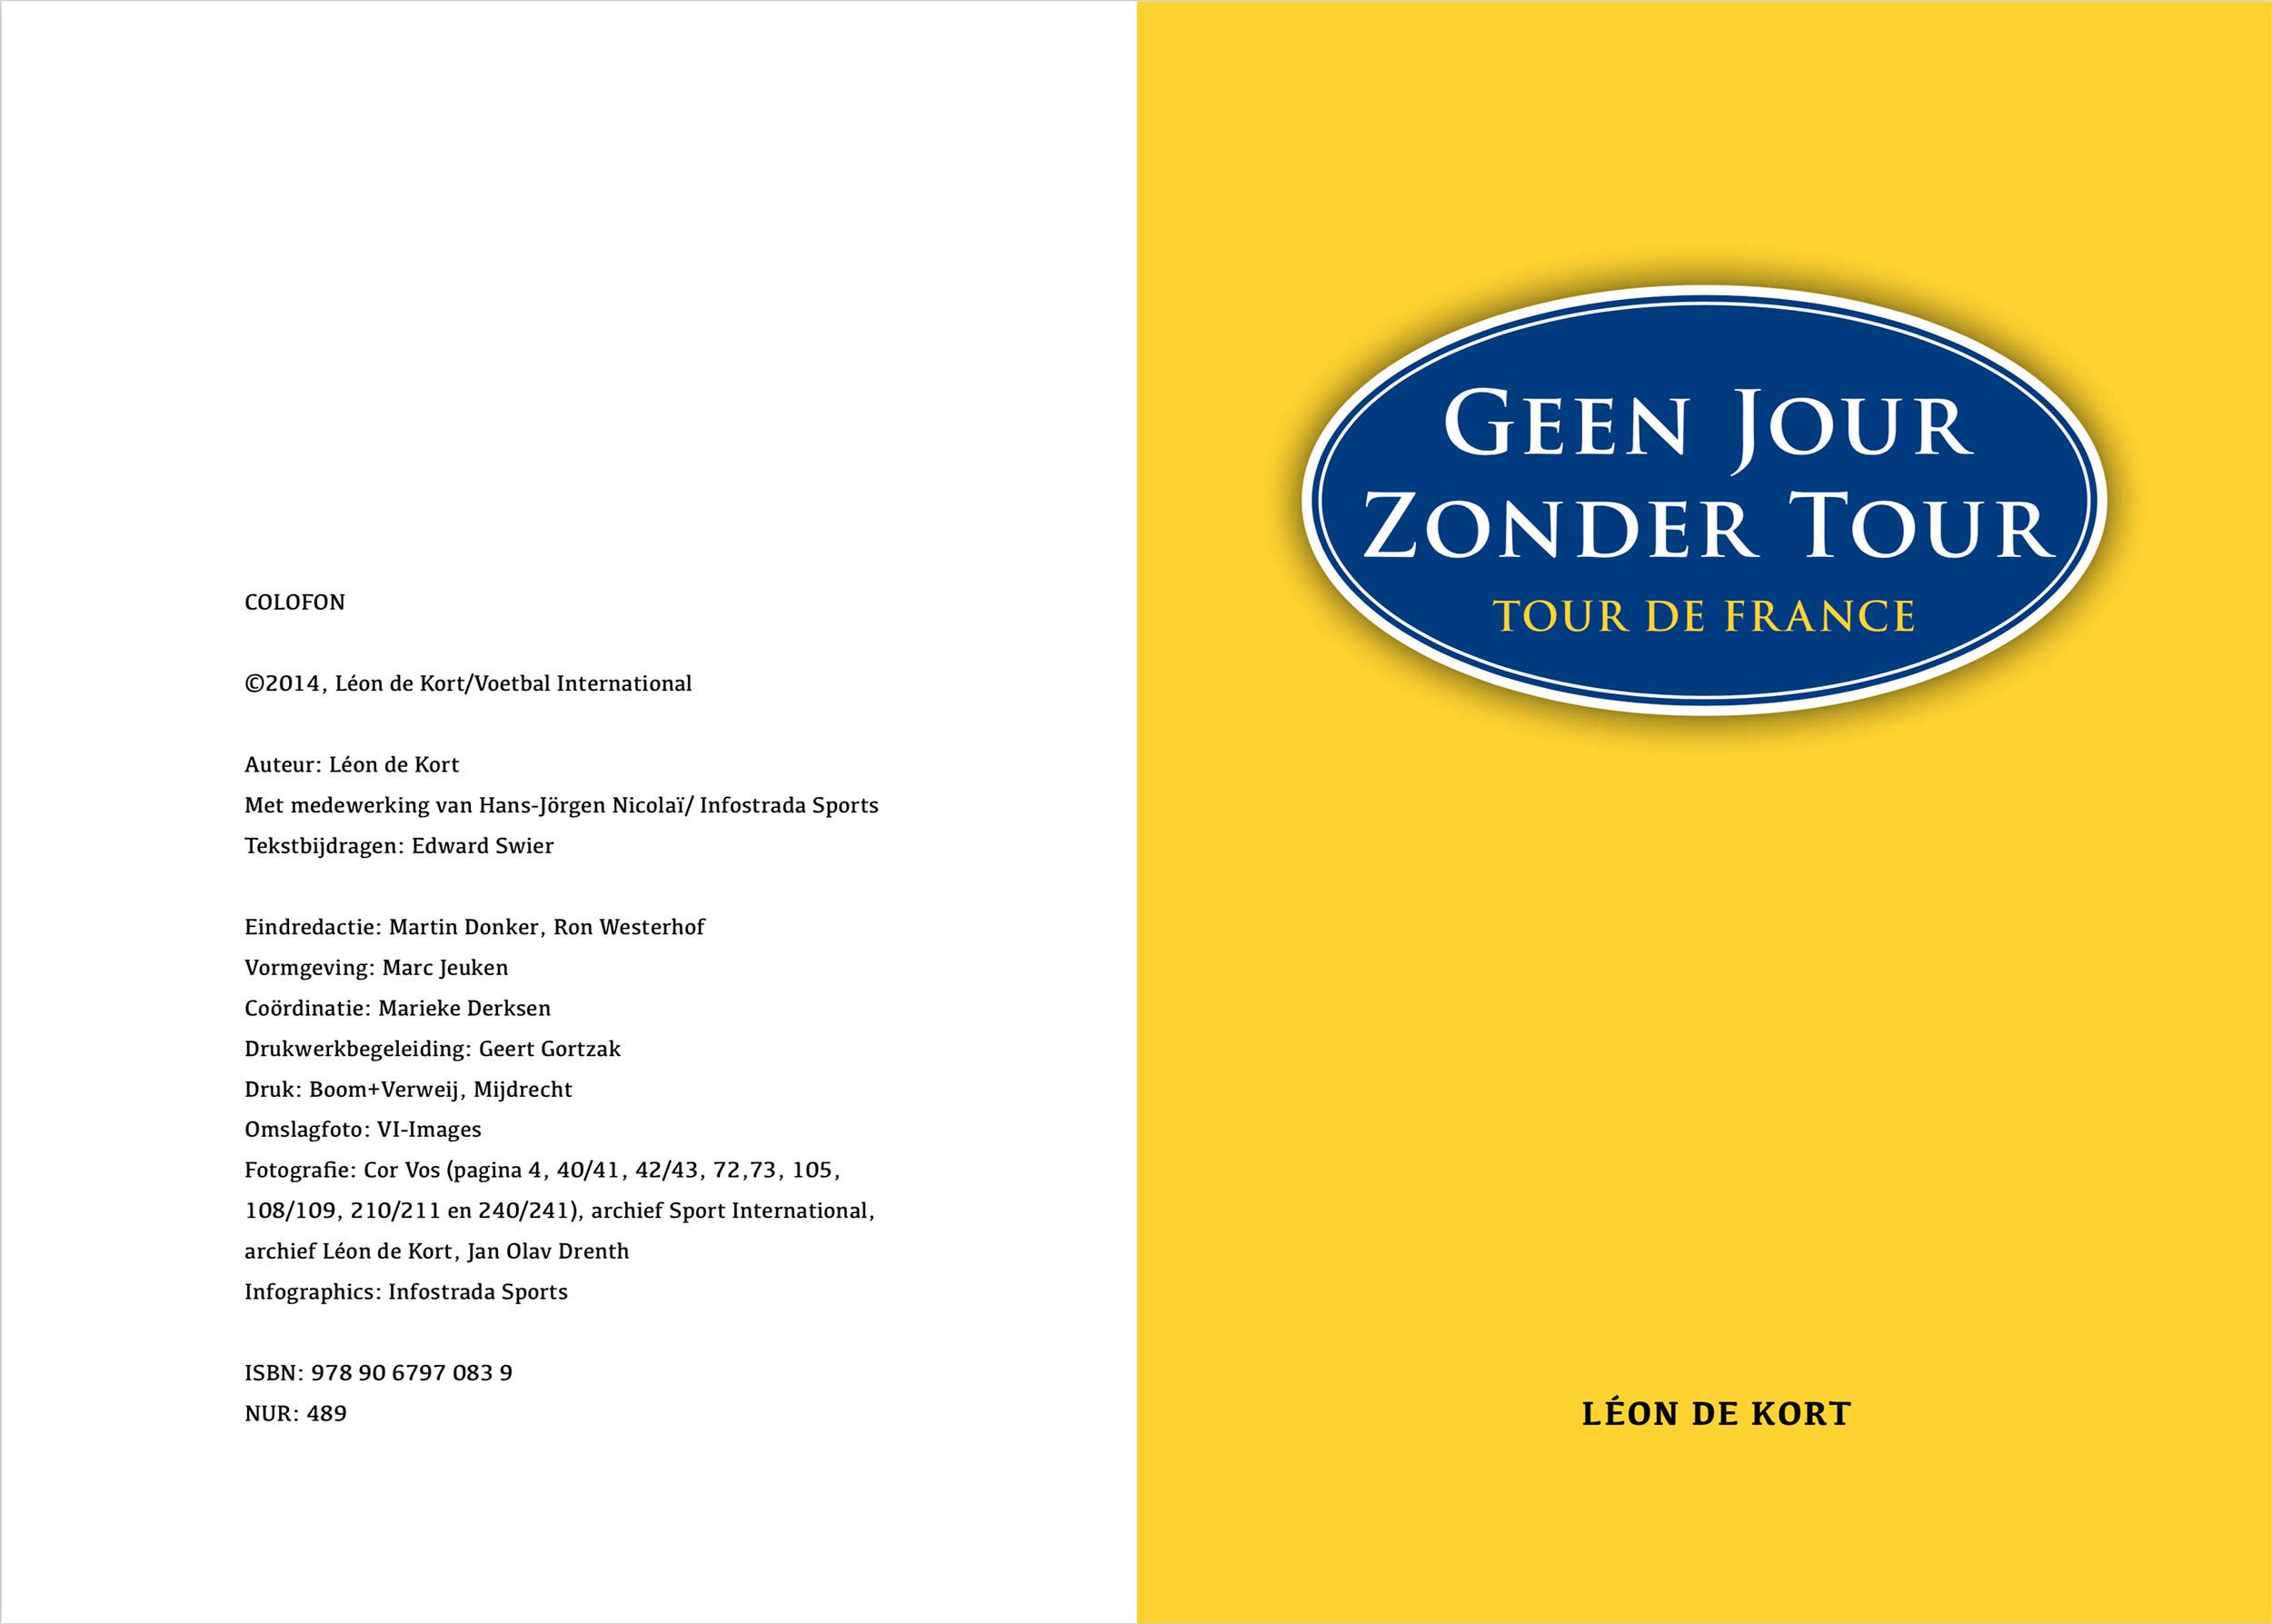 Geen Jour Zonder Tour (colofon, titel)